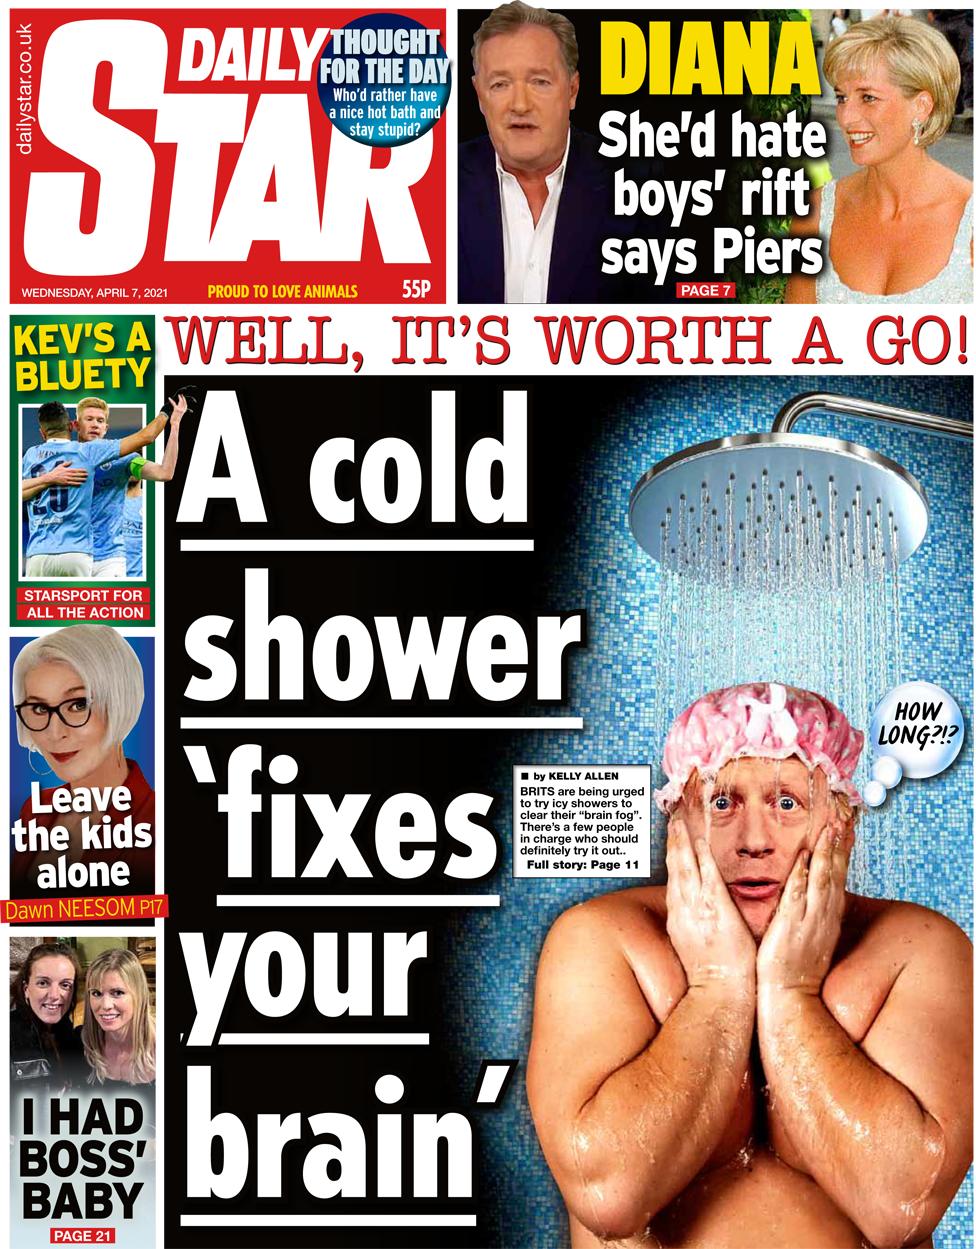 Daily Star Wednesday